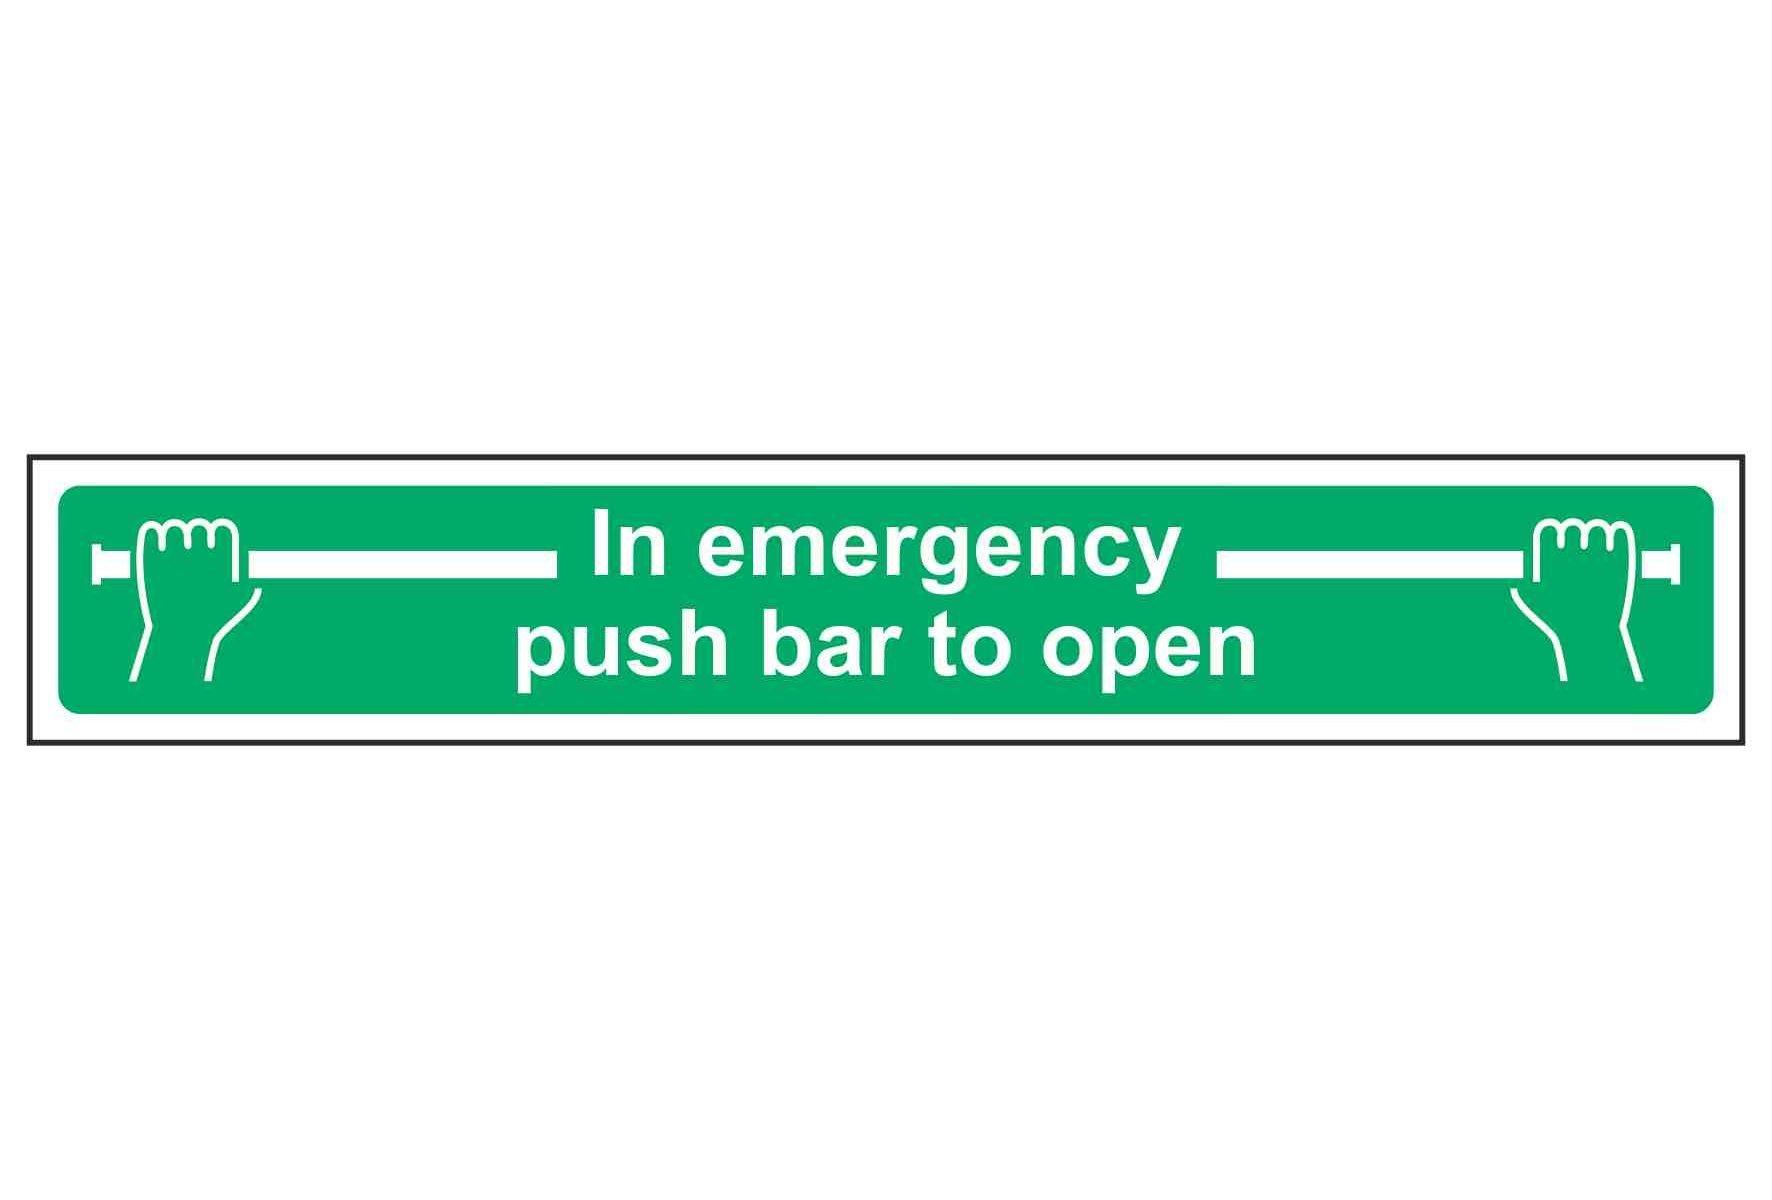 In emergency push bar to open